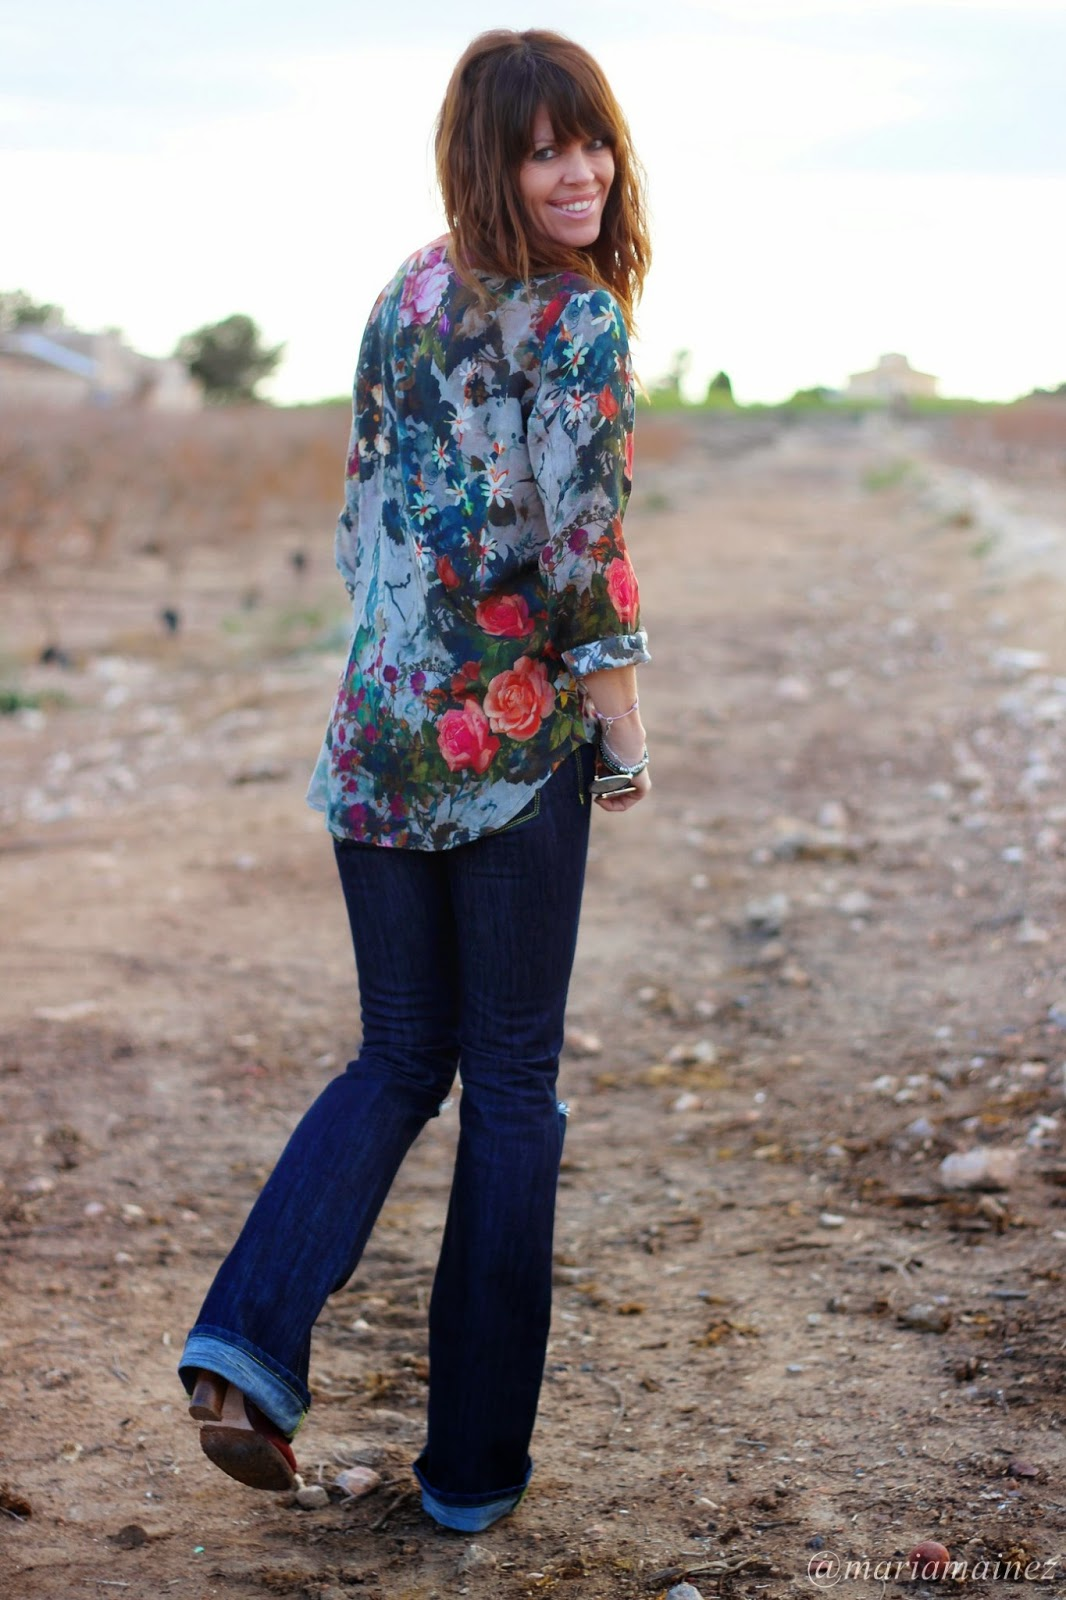 Parka Met - Pantalón Campana - Camisa flores - Etxart&panno- fashion blogger